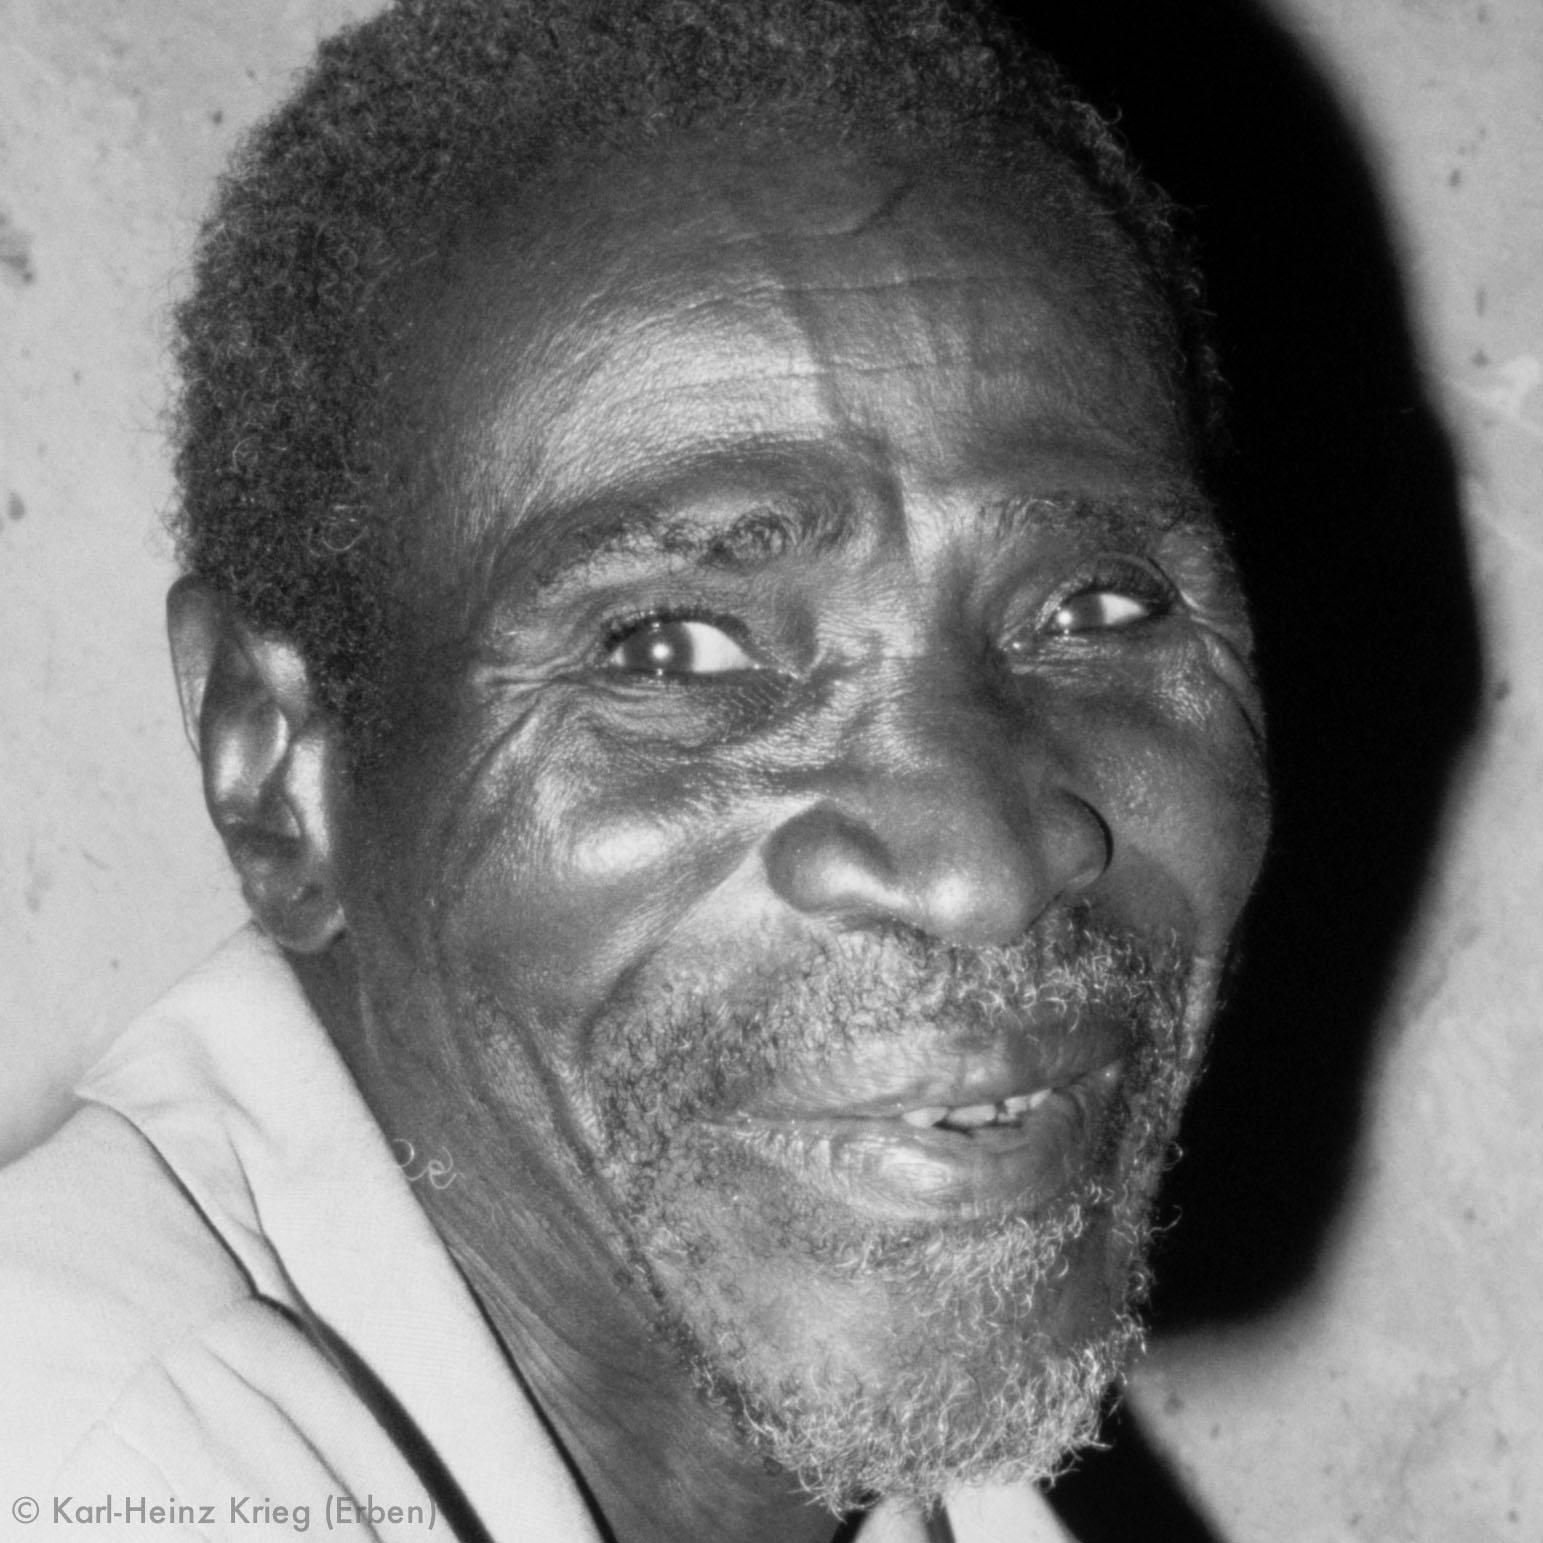 Zié Coulibaly